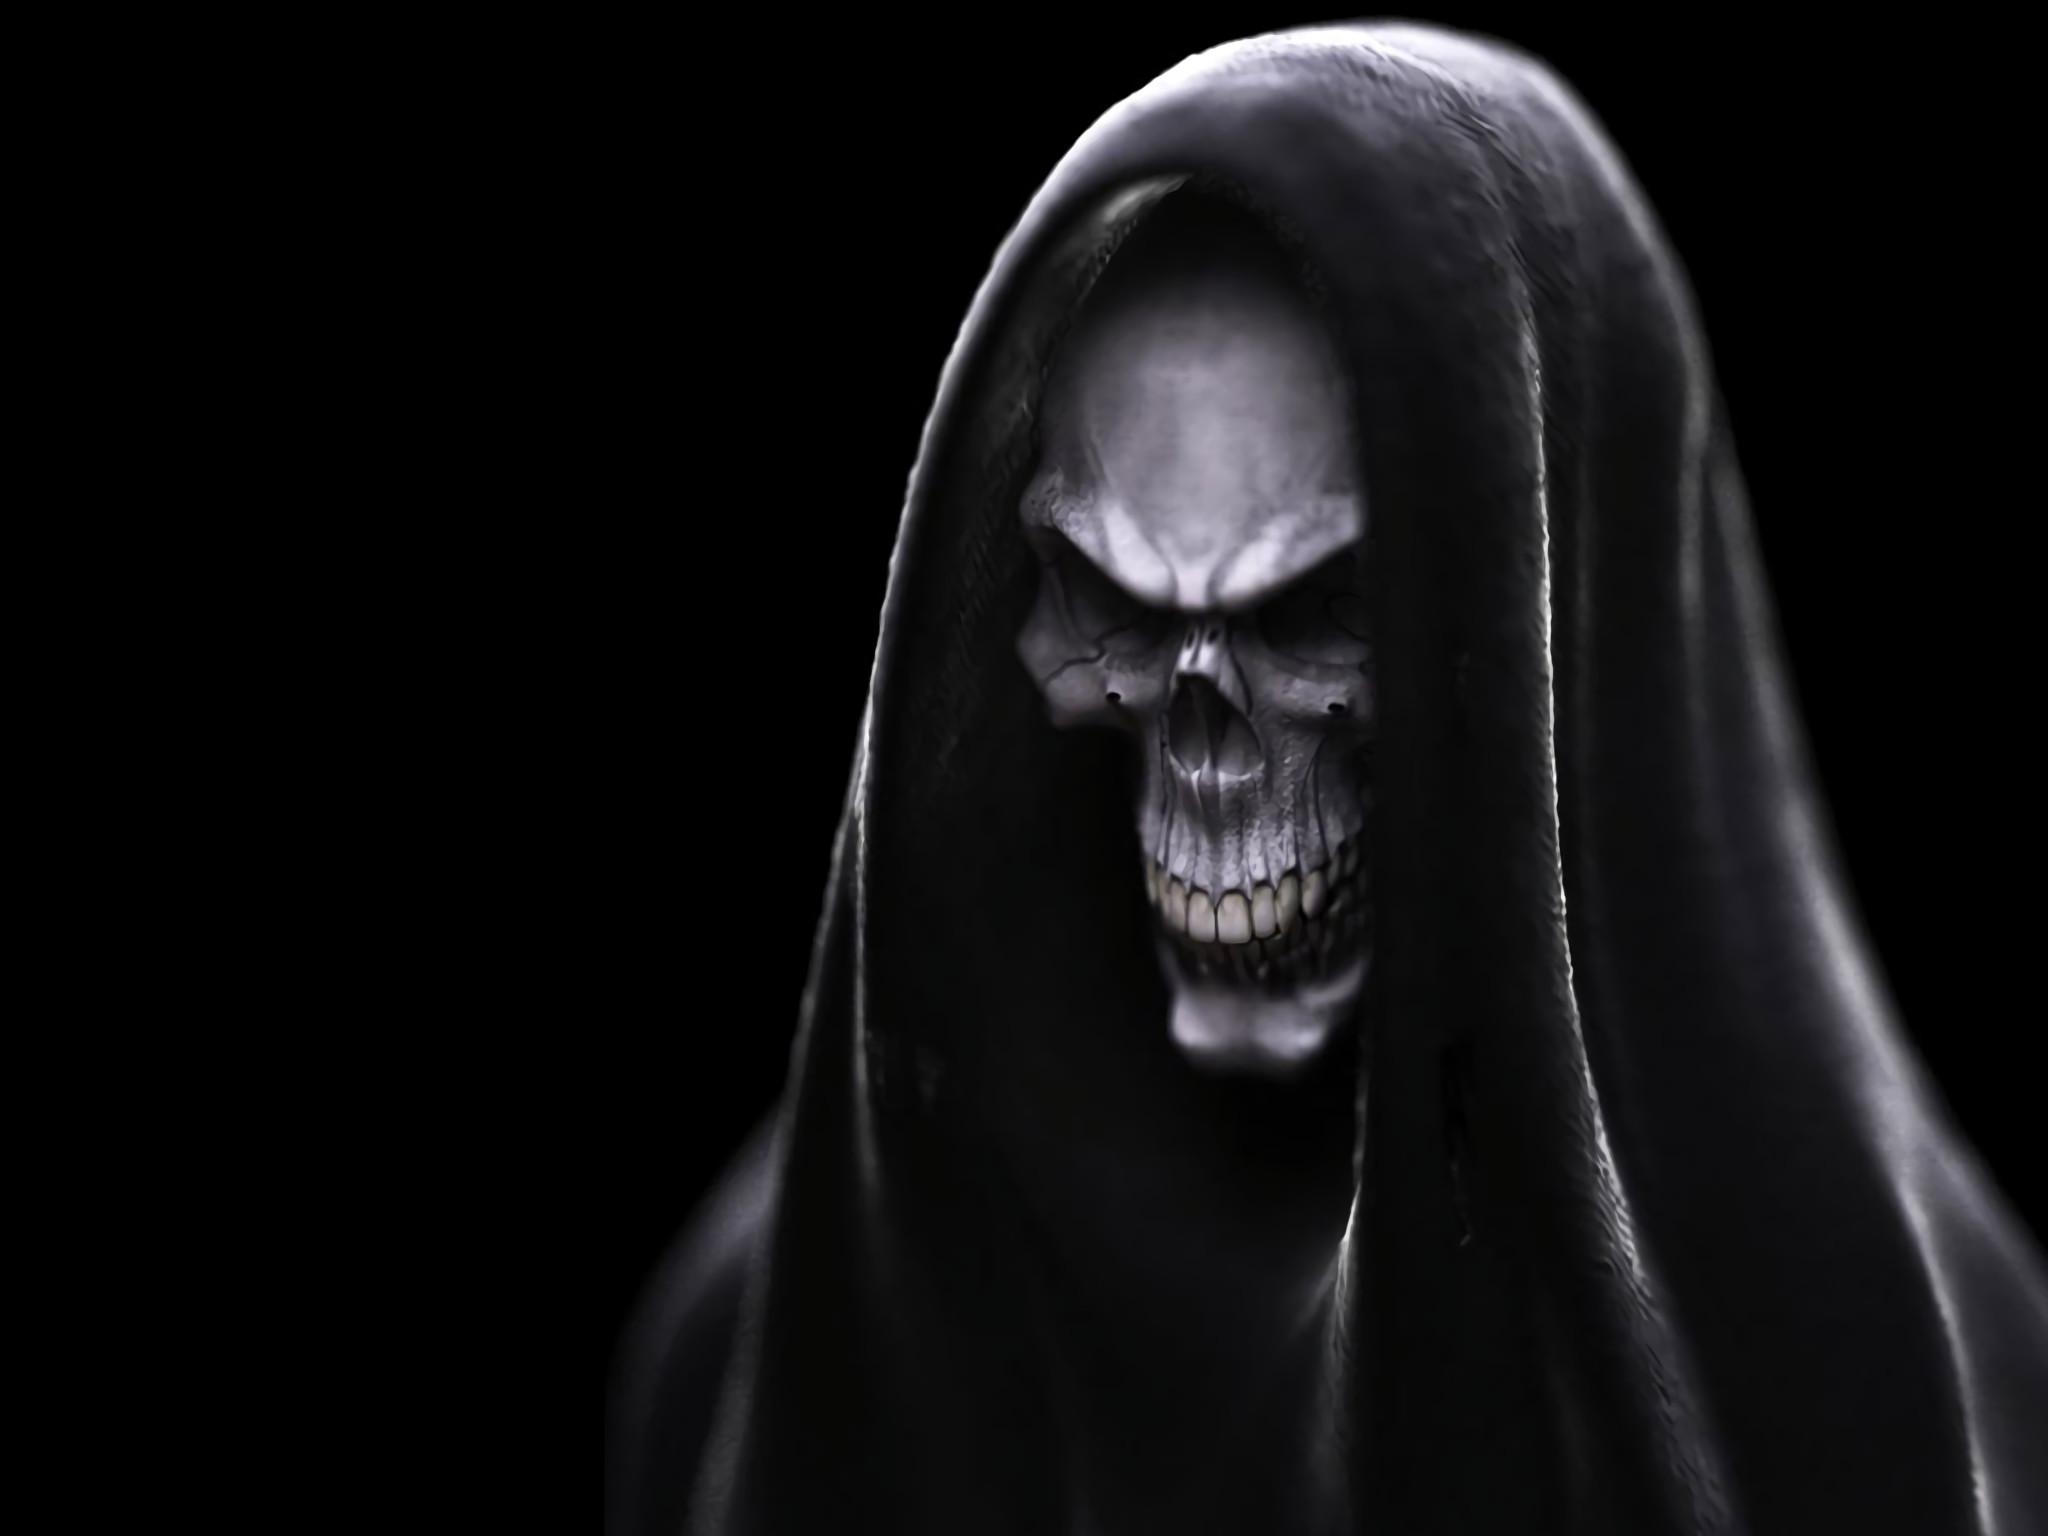 Res: 2048x1536, HD Wallpaper | Background Image ID:7949.  Dark Grim Reaper